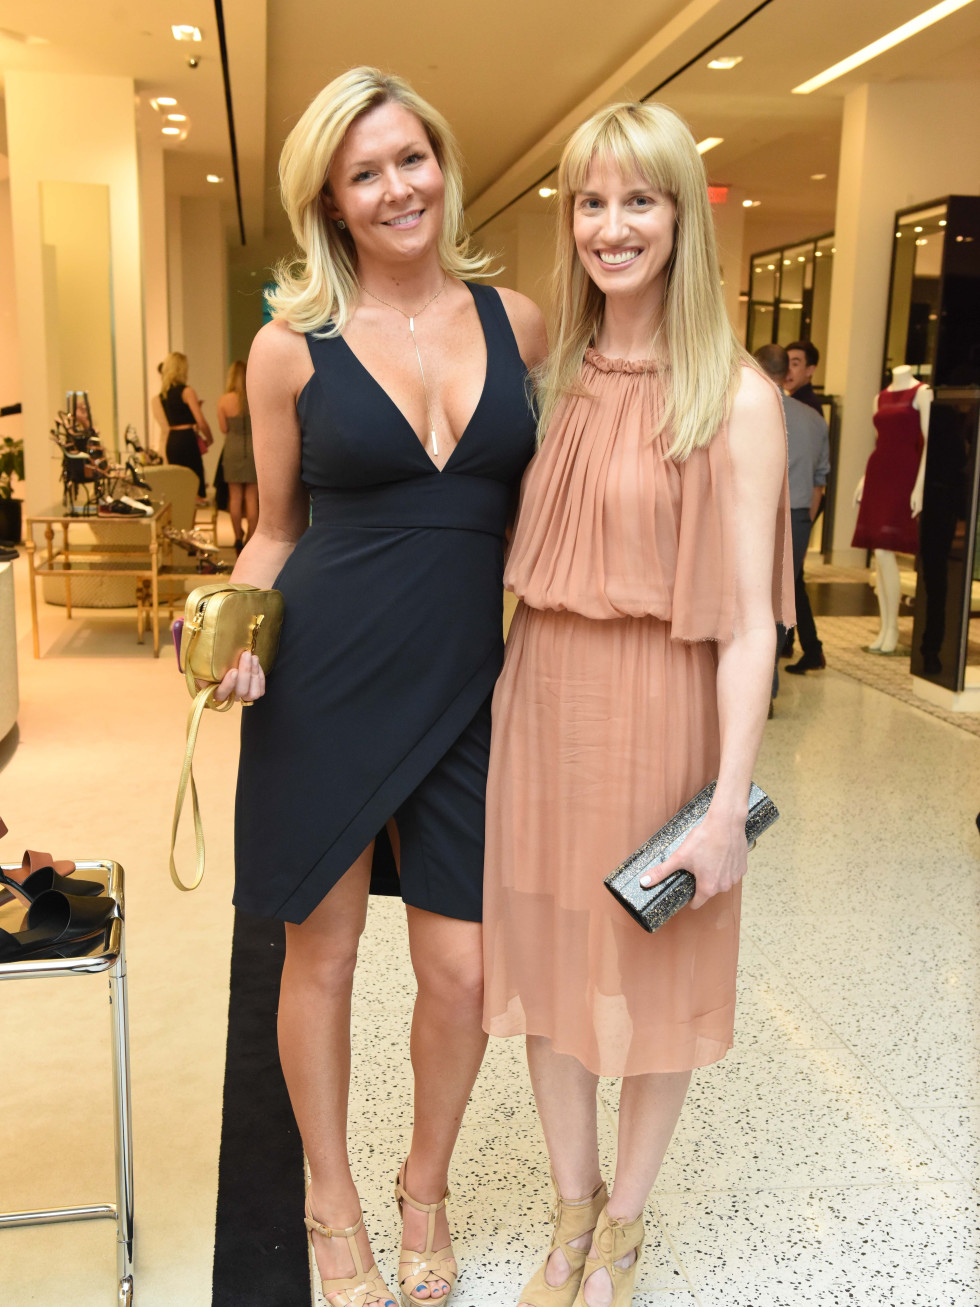 Tootsies Love's In Fashion, Feb. 2016, Christy Iversen, Chris Goins